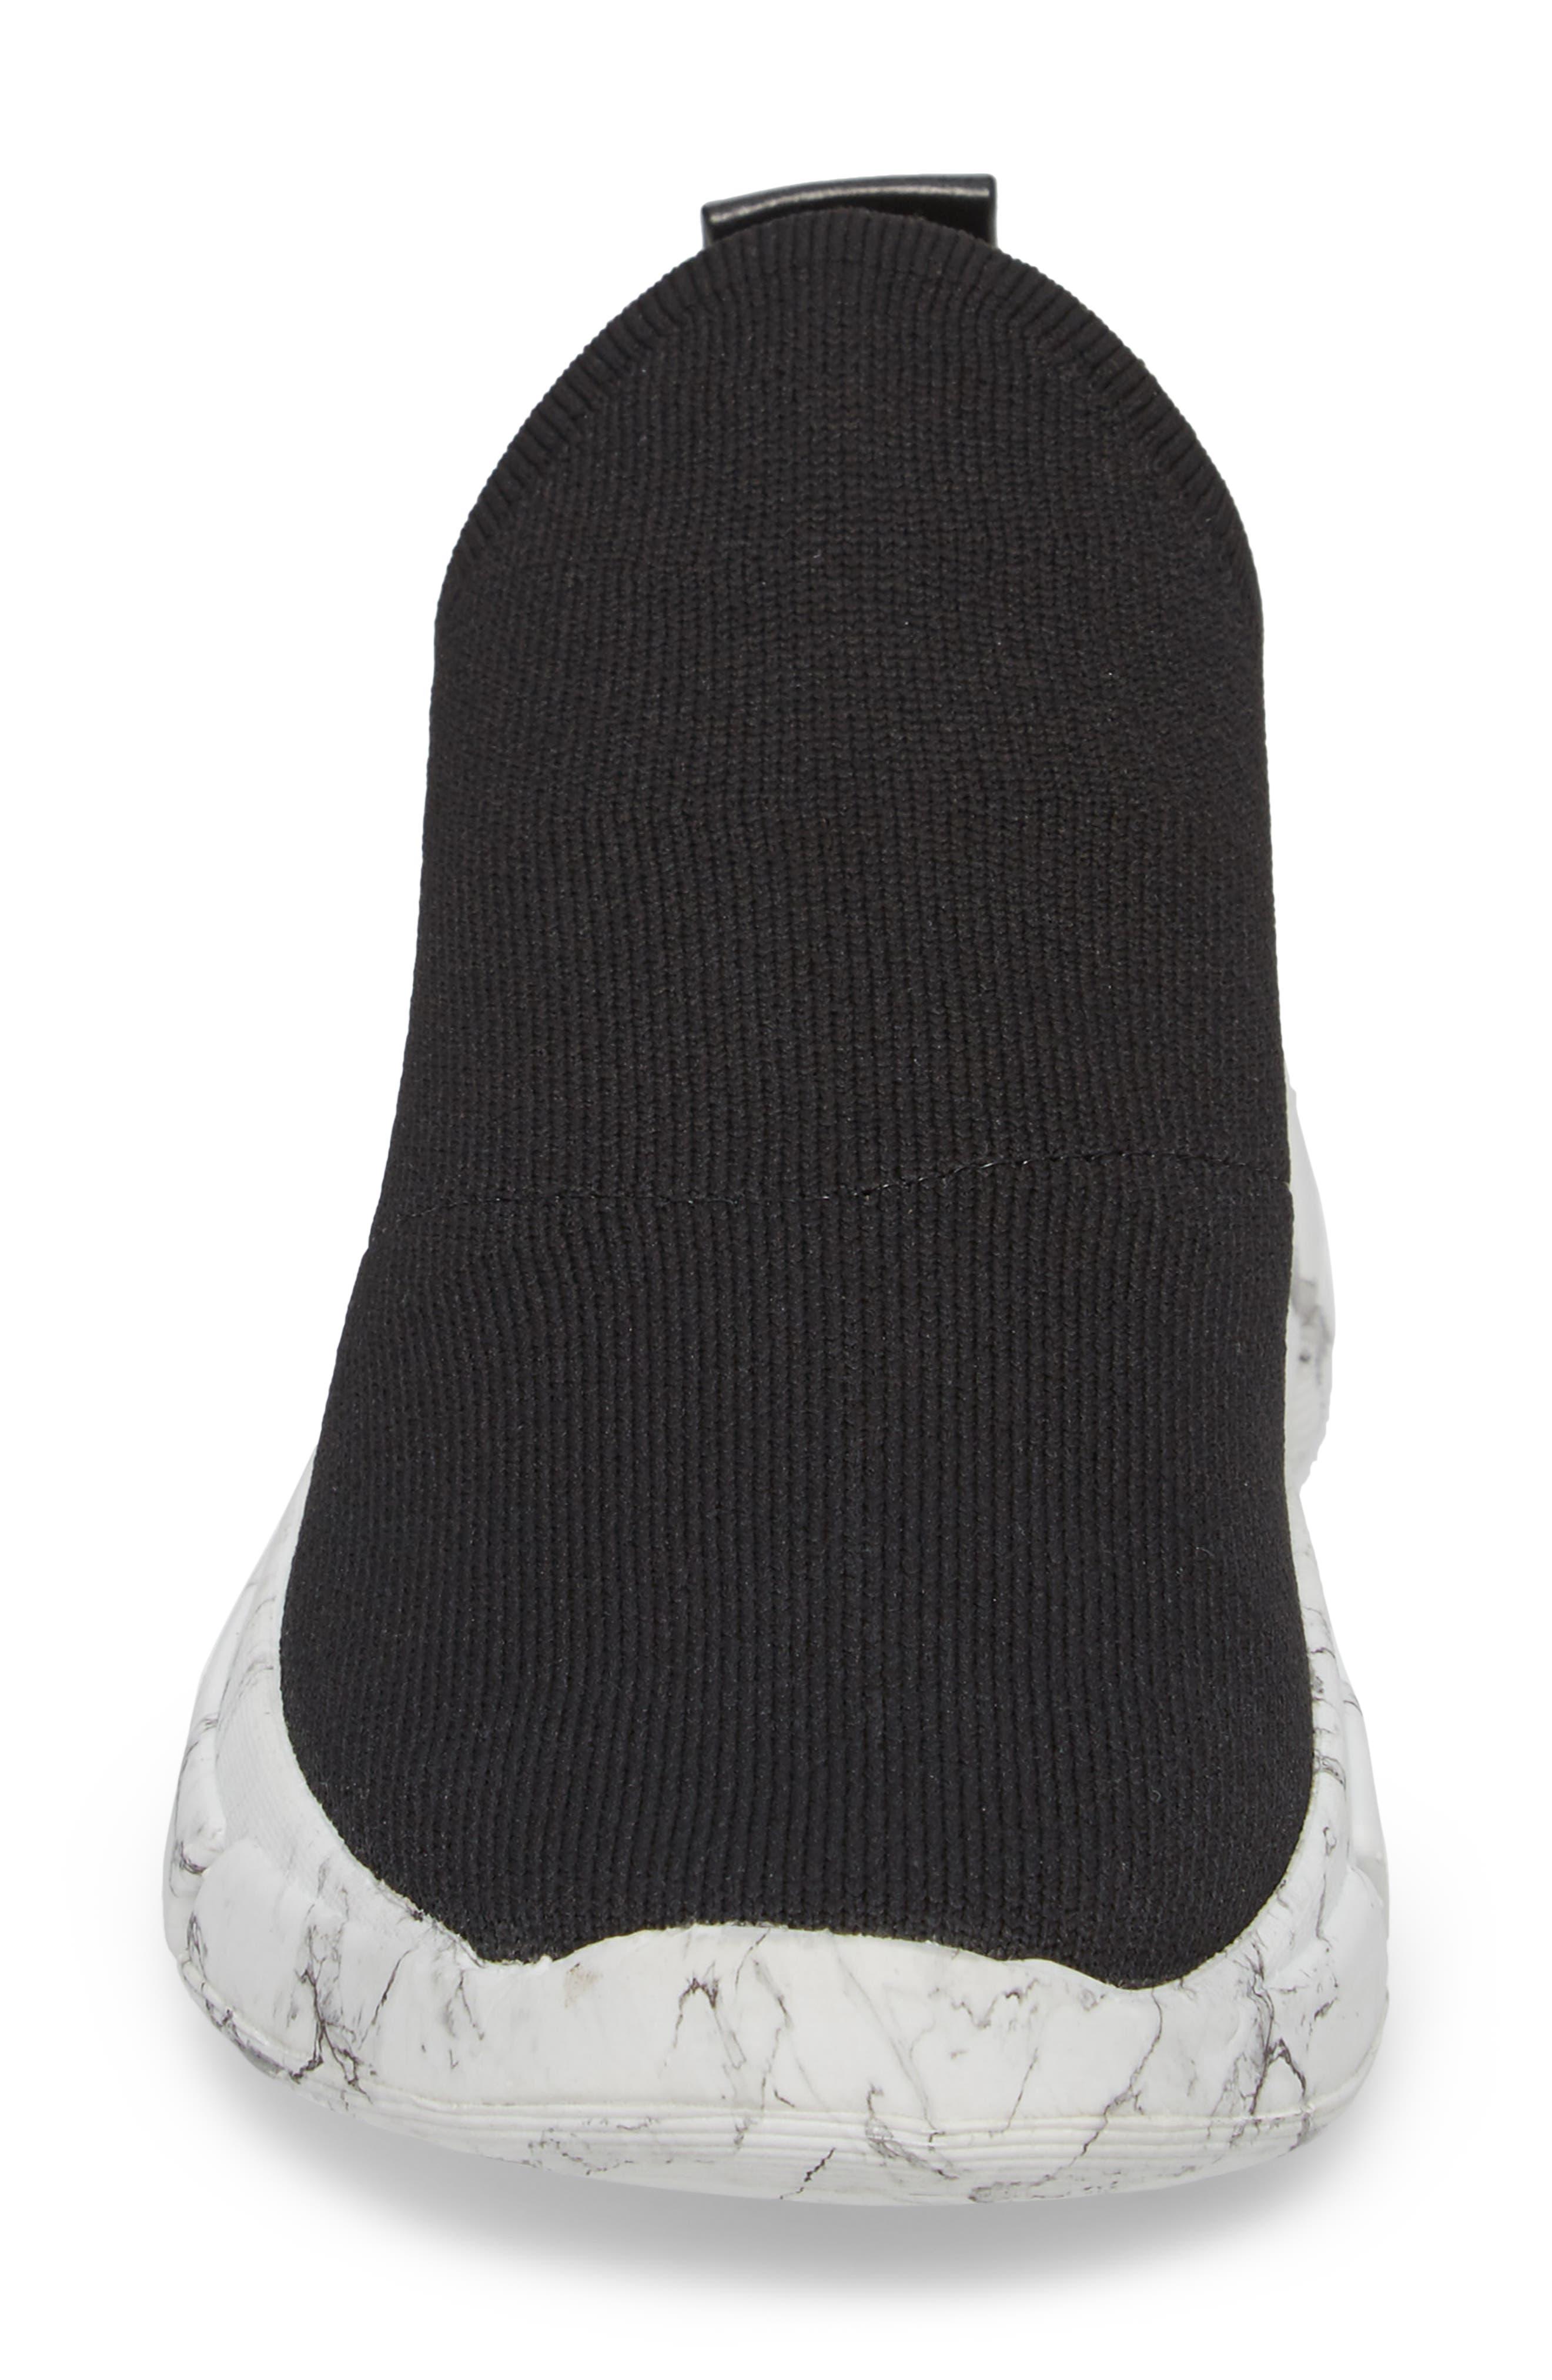 Caleb Knit Sneaker,                             Alternate thumbnail 4, color,                             BLACK